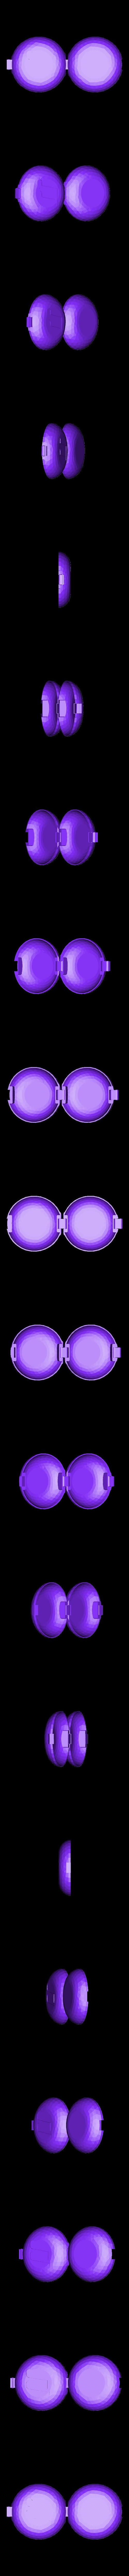 earphone_case.stl Download free STL file Print-In-Place Earphone Case • 3D print design, silorak10